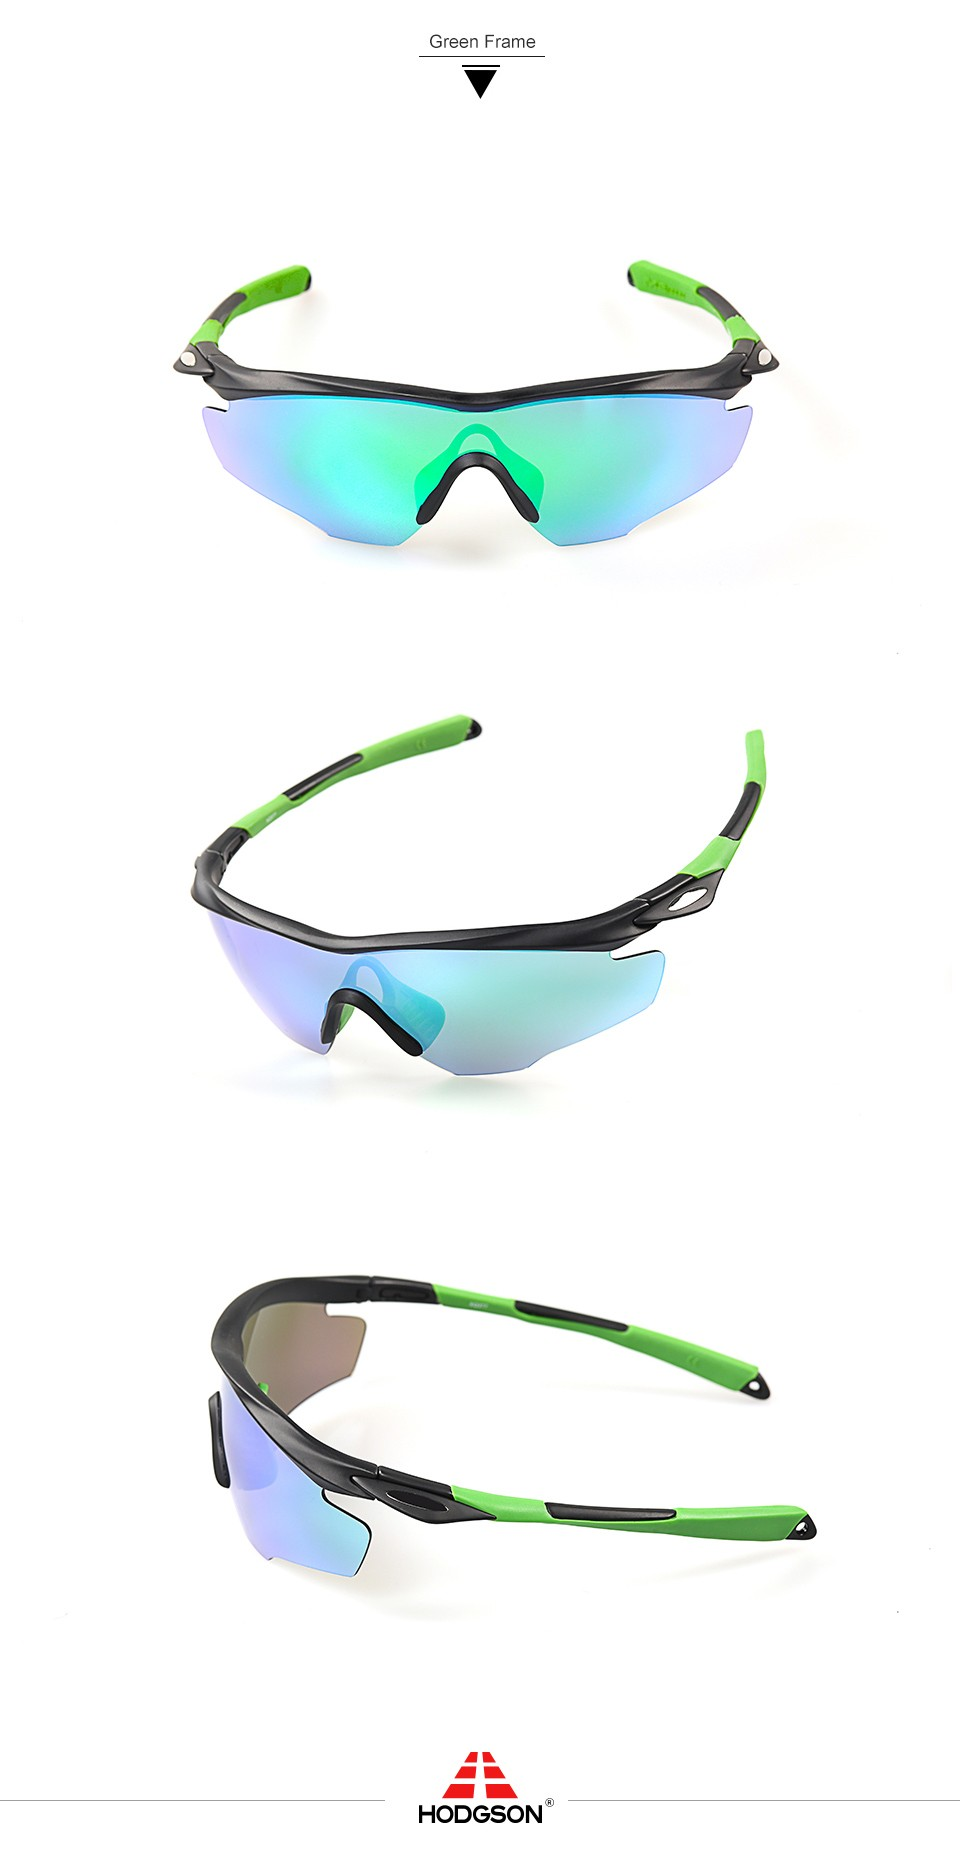 8c22ab6c5b HODGSON 2017 UV400 Cycling Glasses Polarized Bicycle Glasses Sports Goggles  Sunglasses for Men Women Ultralight MTB Glasses 1064USD 36.00 piece